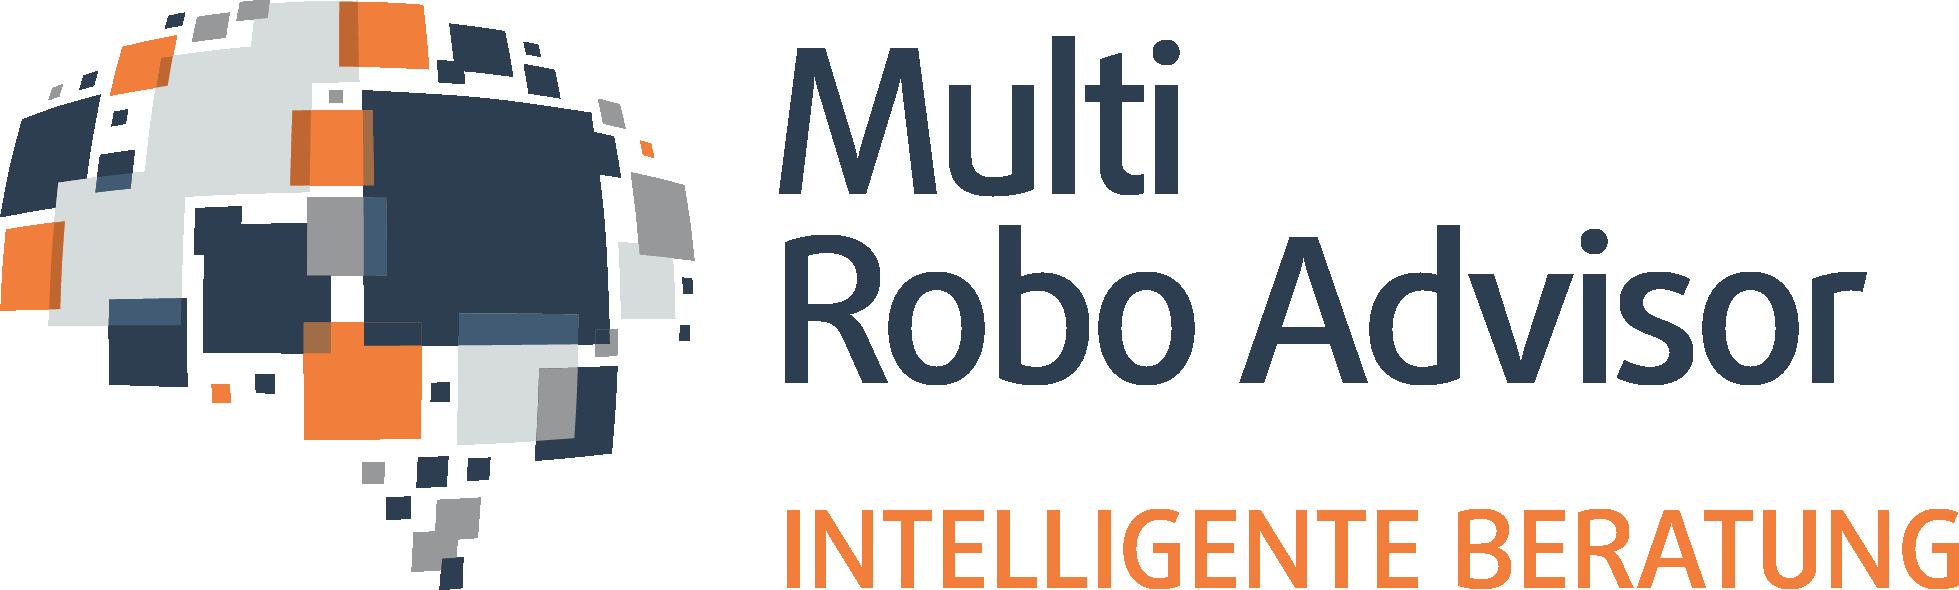 Multi Robo Advisor GmbH